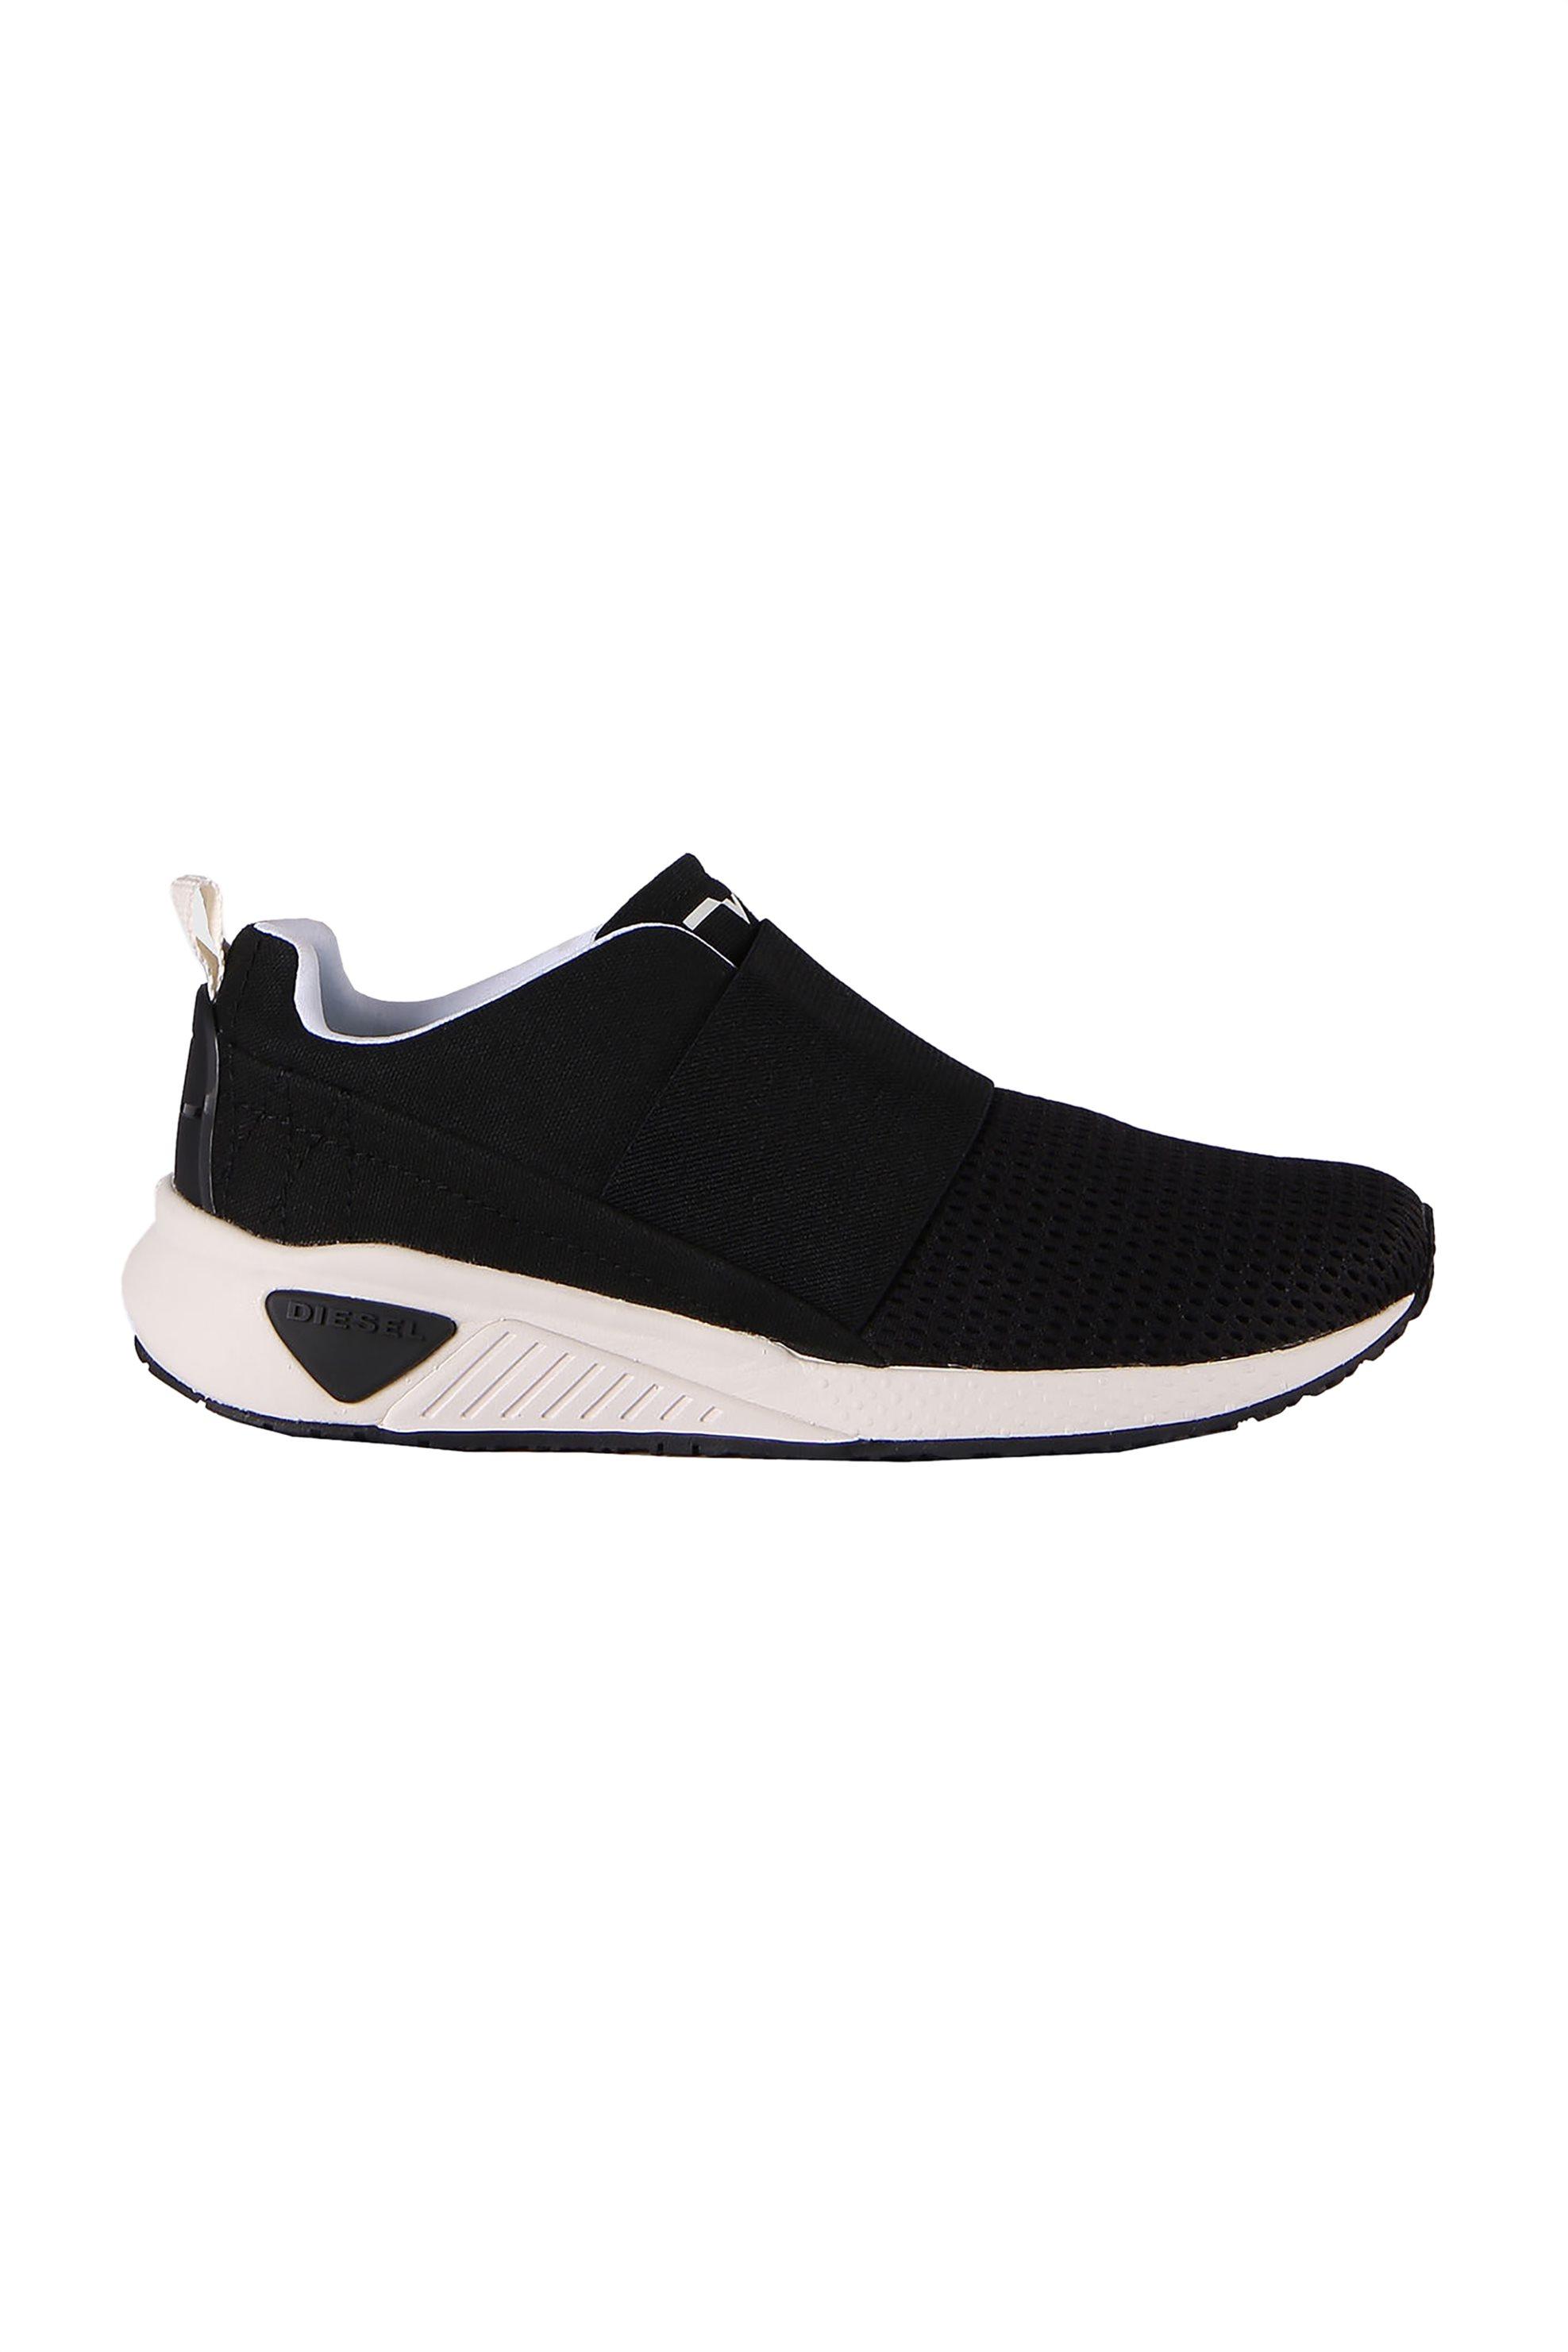 33e935e8118 -20% Notos Diesel γυναικεία sneakers χωρίς κορδόνια s kb Εlastic – Y01705  P1608 – Μαύρο